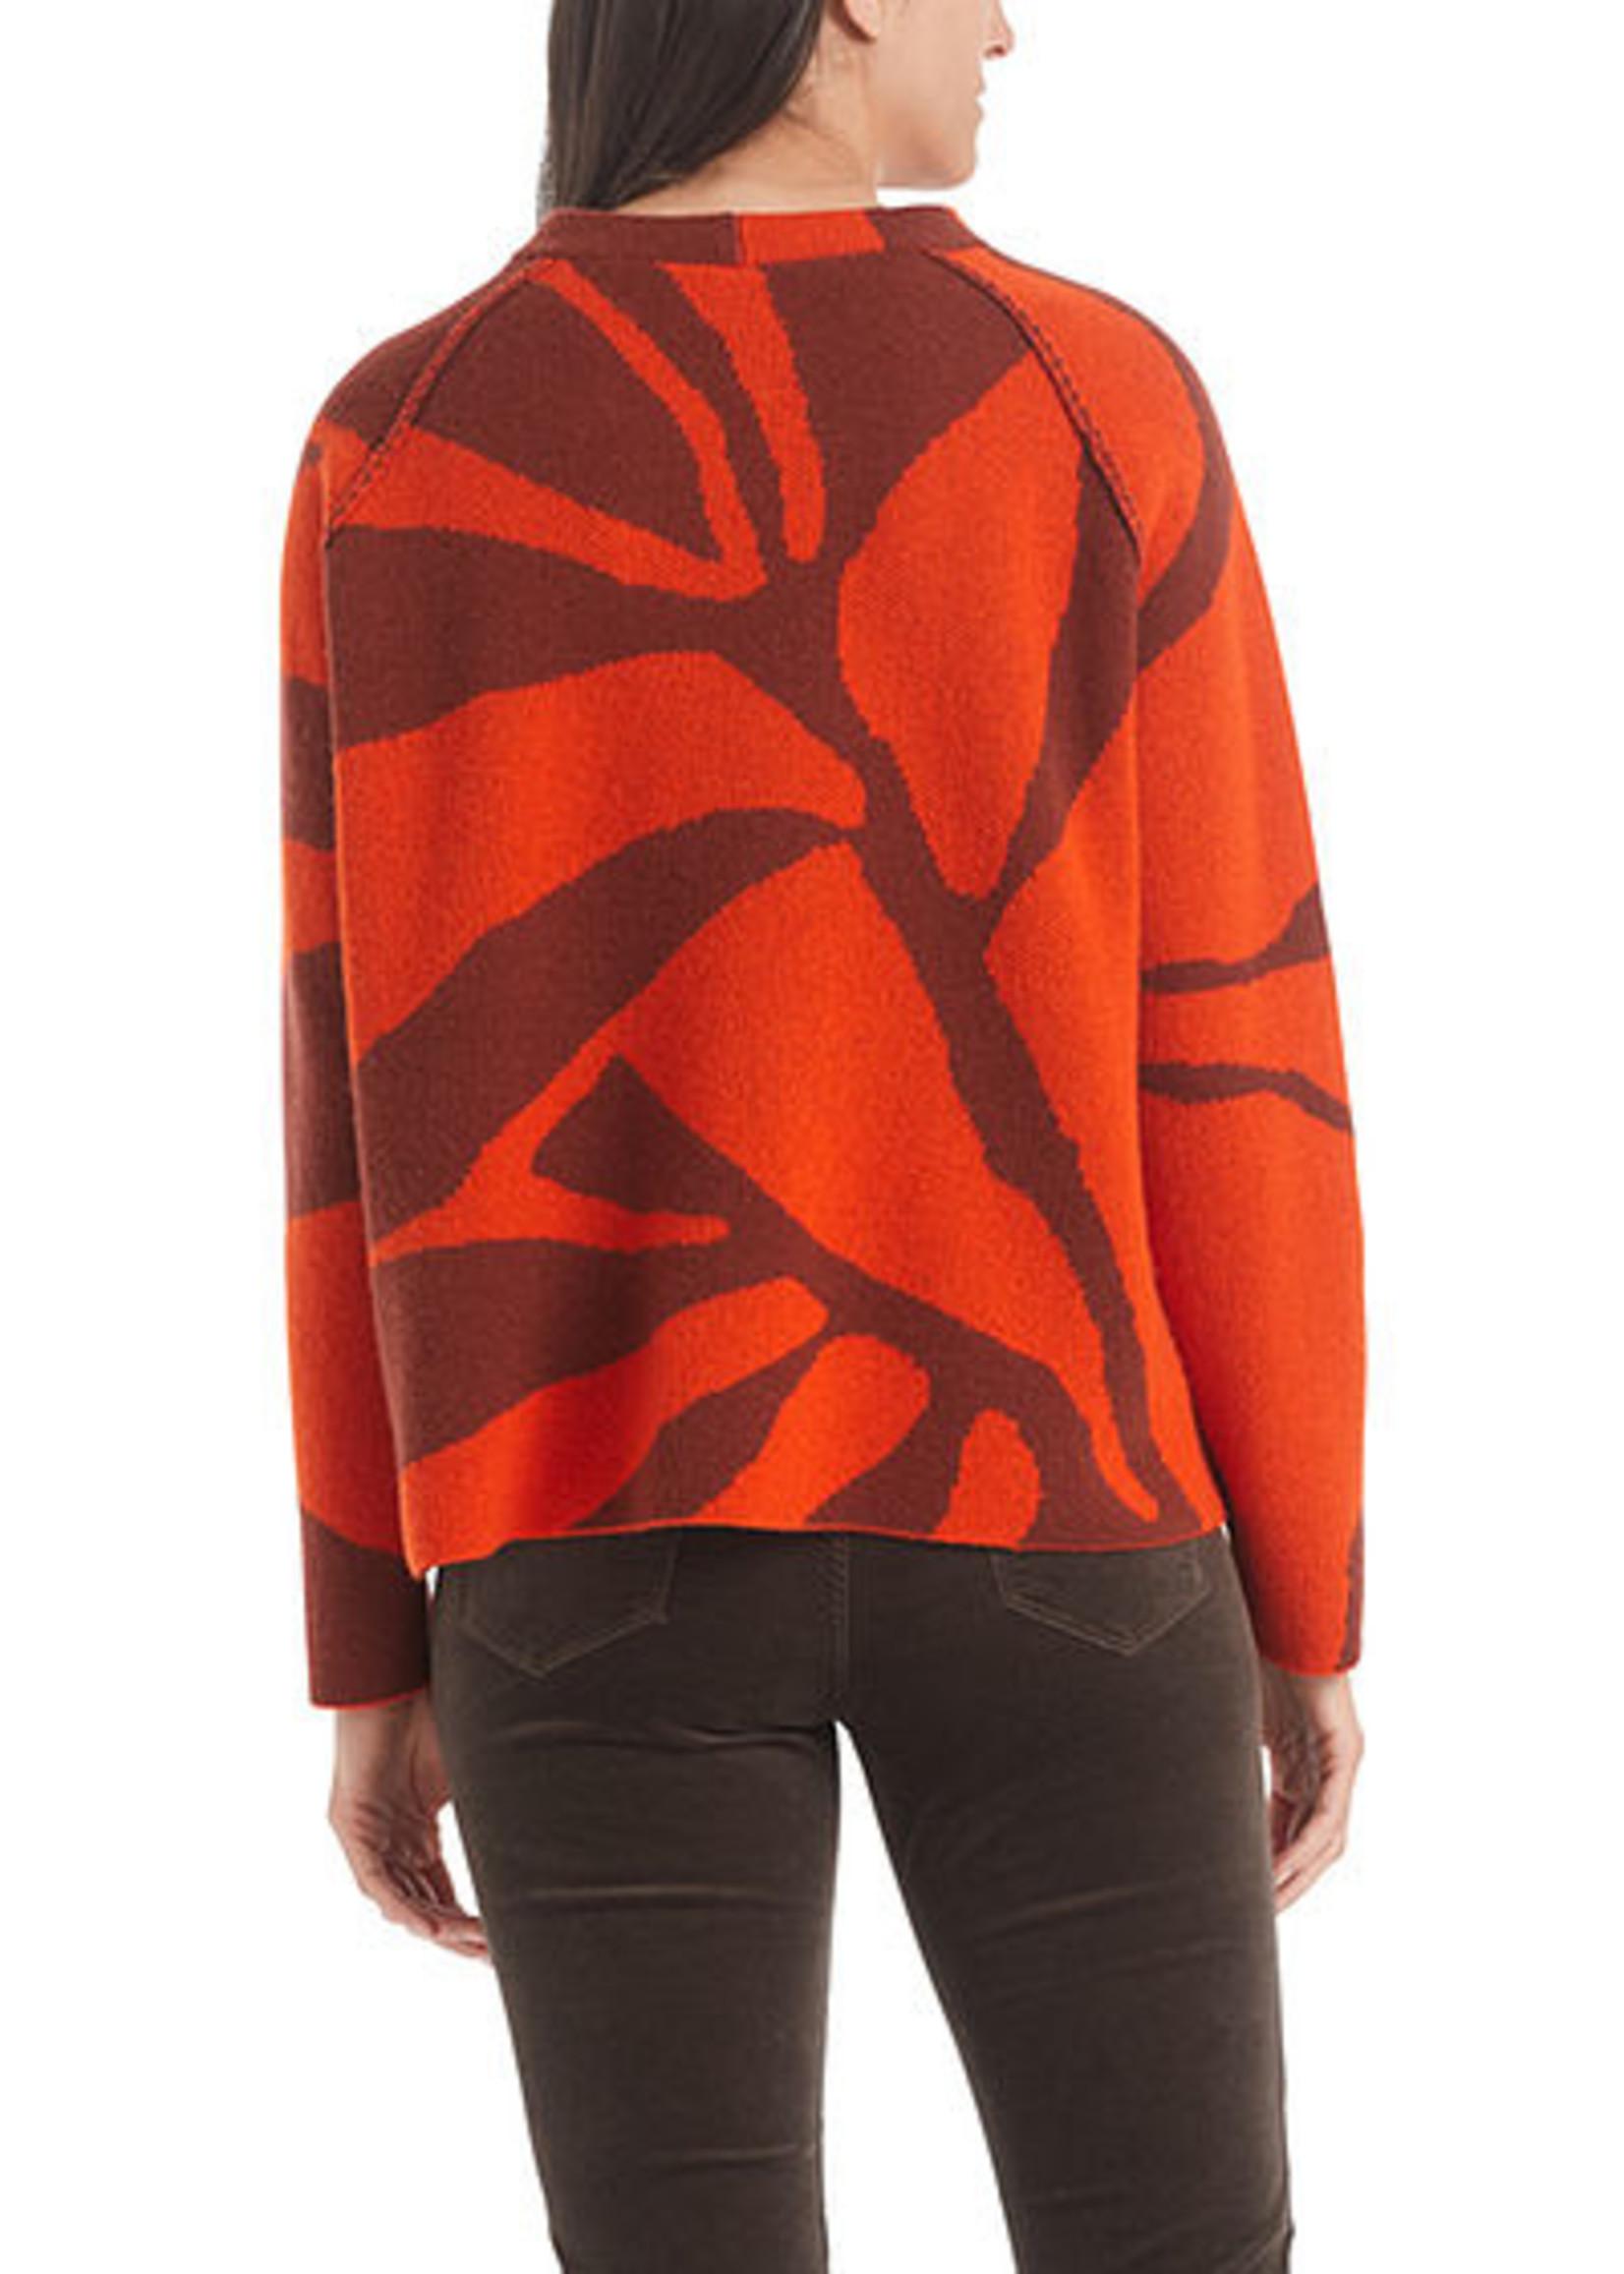 Sweater RC 41.41 M86 hokkaido